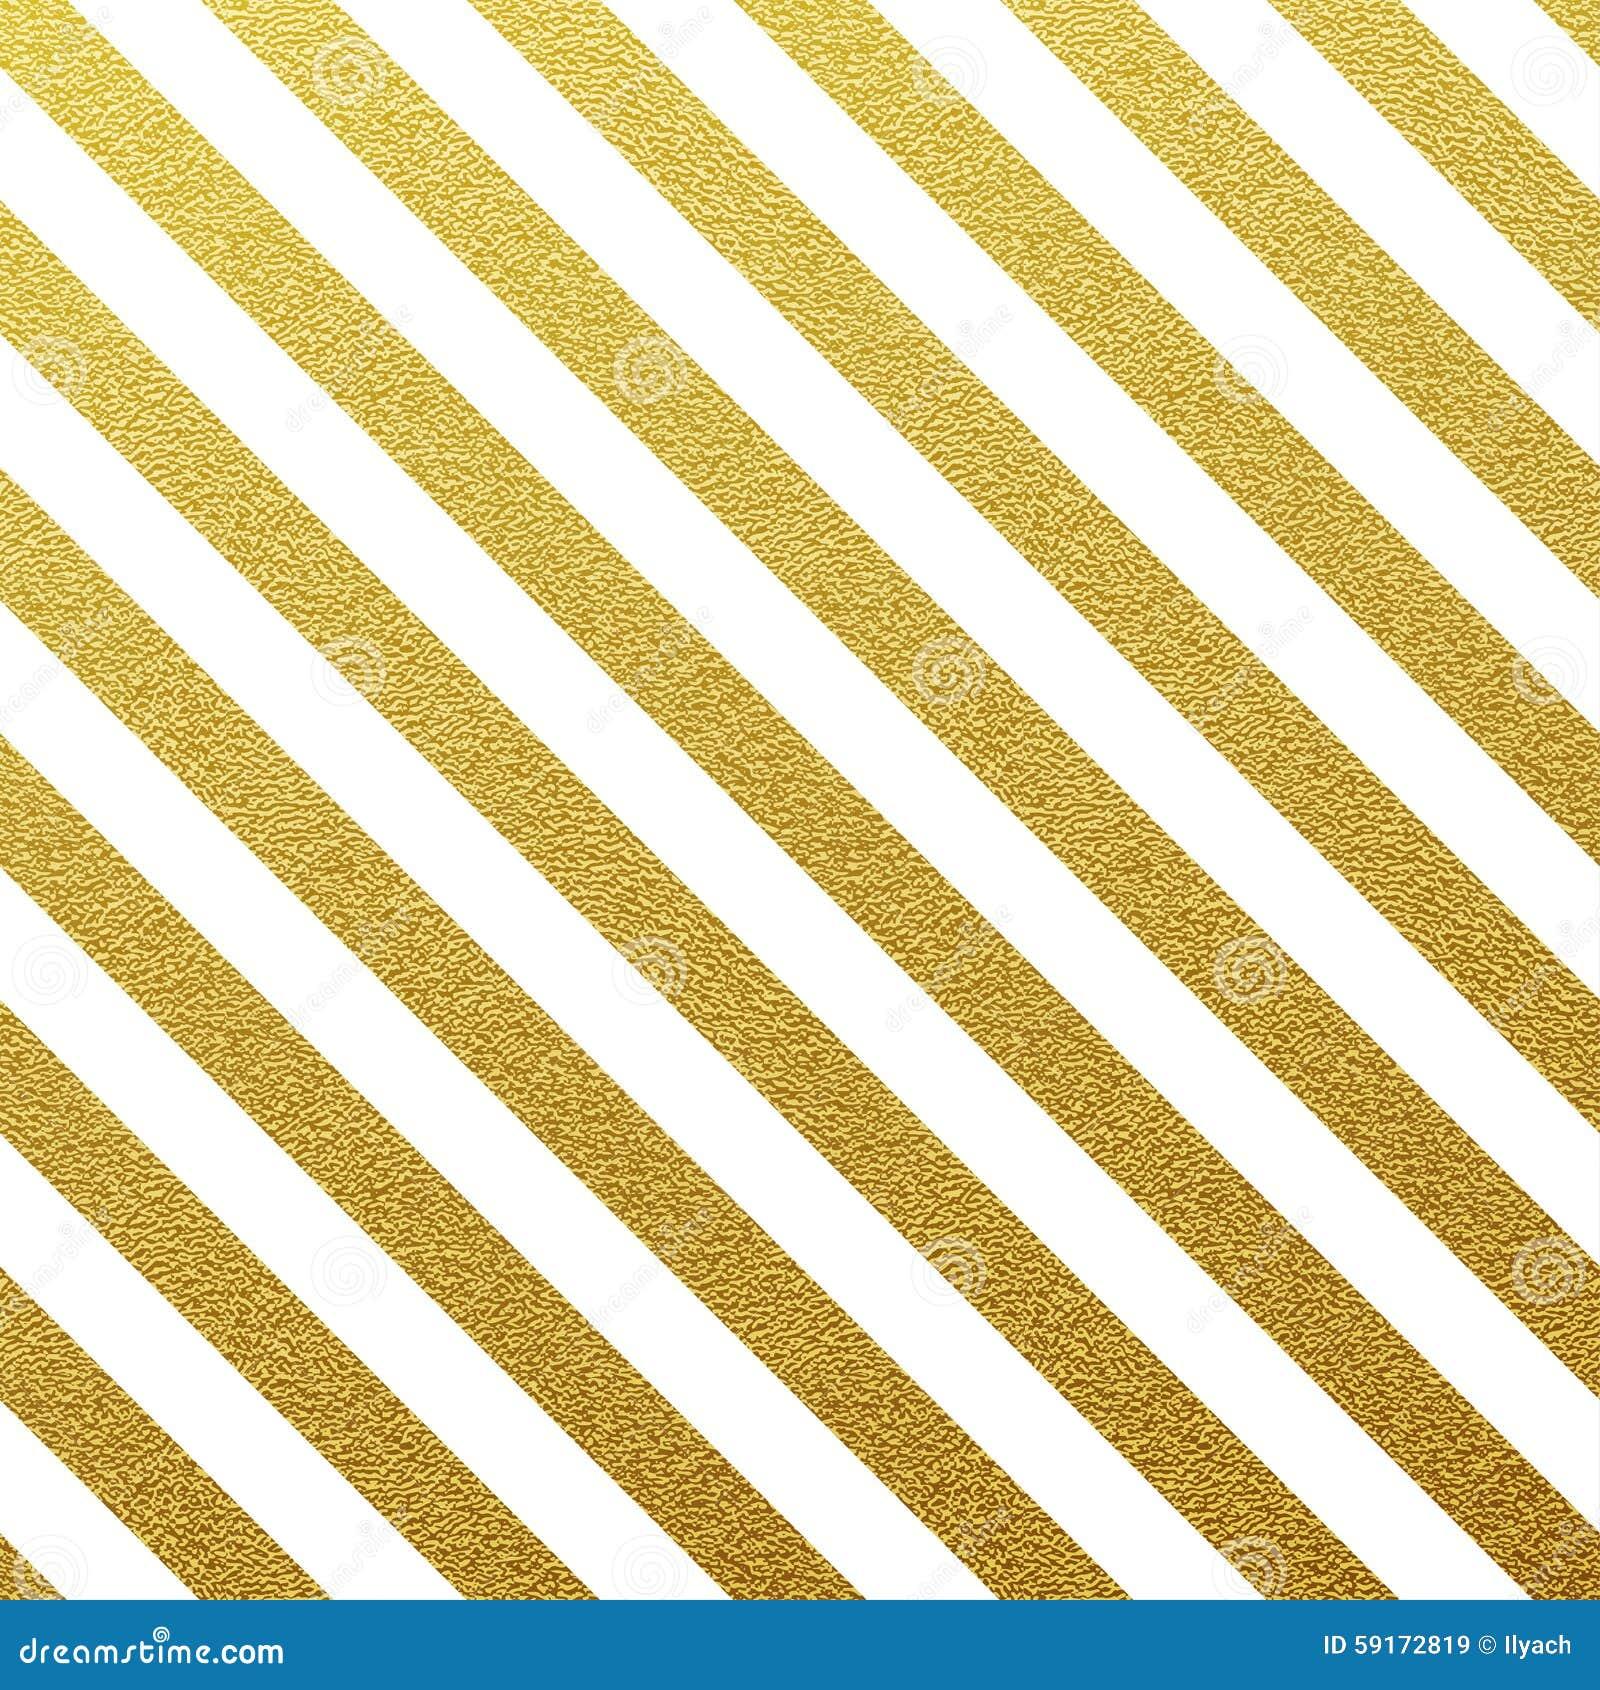 wallpaper black and white stripes